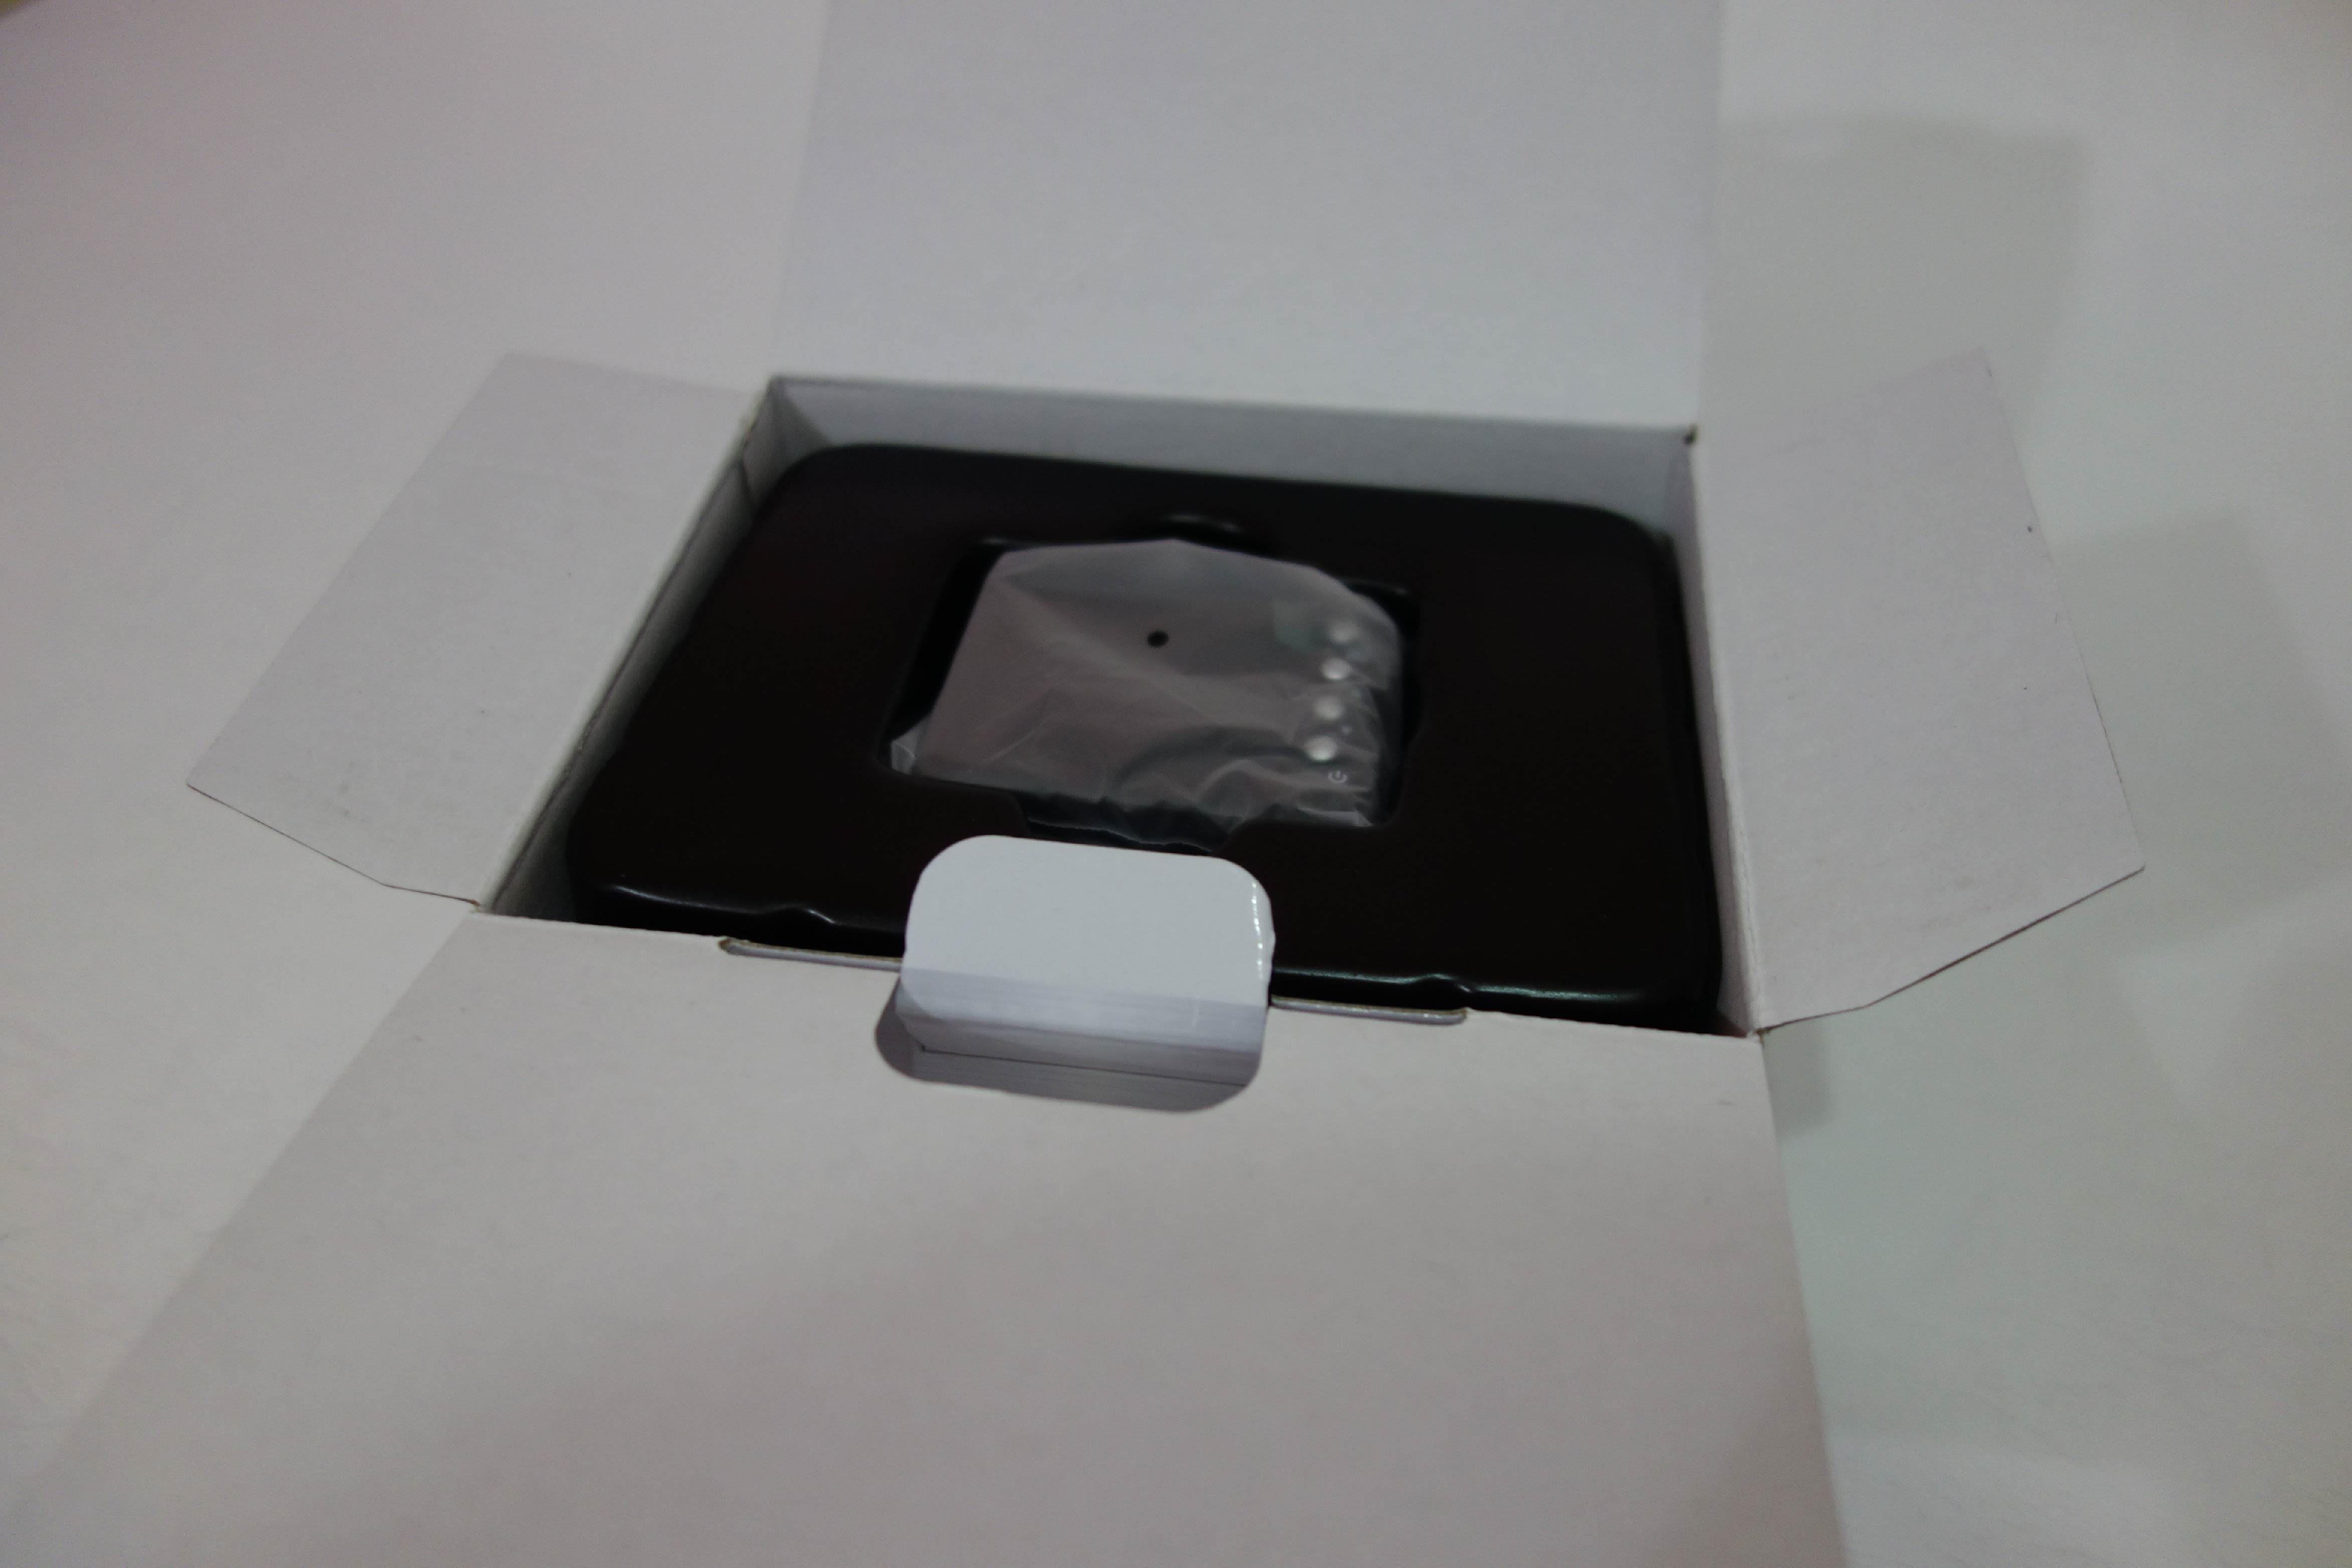 ELK-美商NANO CAMPRO T3頂級版行車紀錄器 1080P FULL HD超強夜拍王 採用聯詠96650夜視處理晶片(保固詳情請參閱商品描述) 3